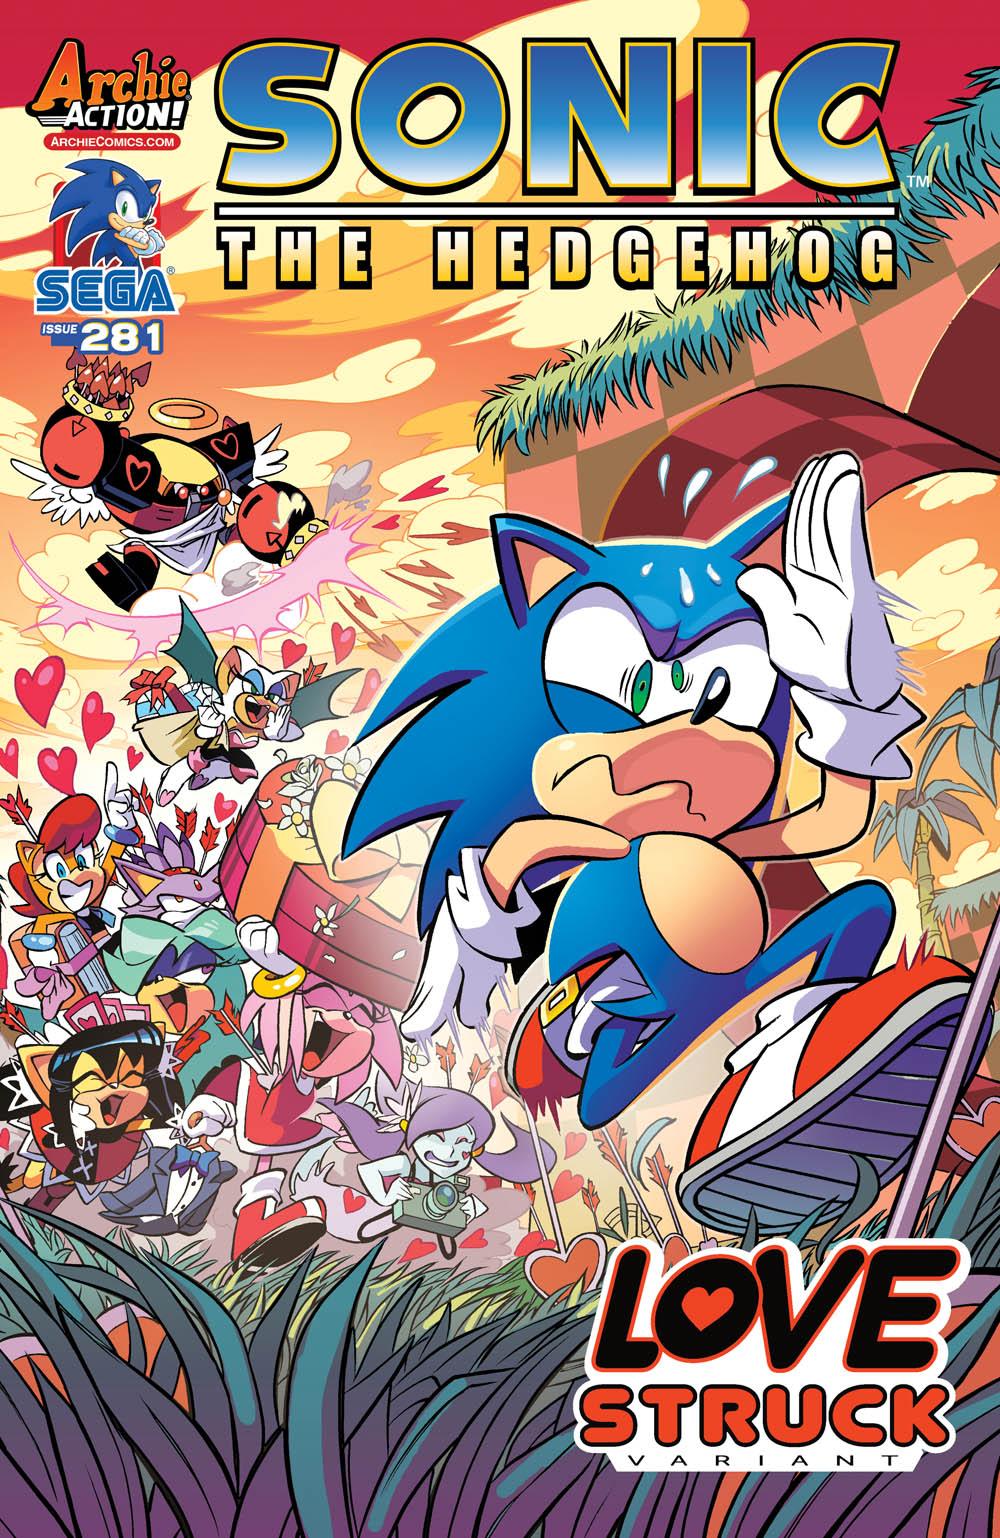 281 Variant Cover Archie Sonic Comics Know Your Meme